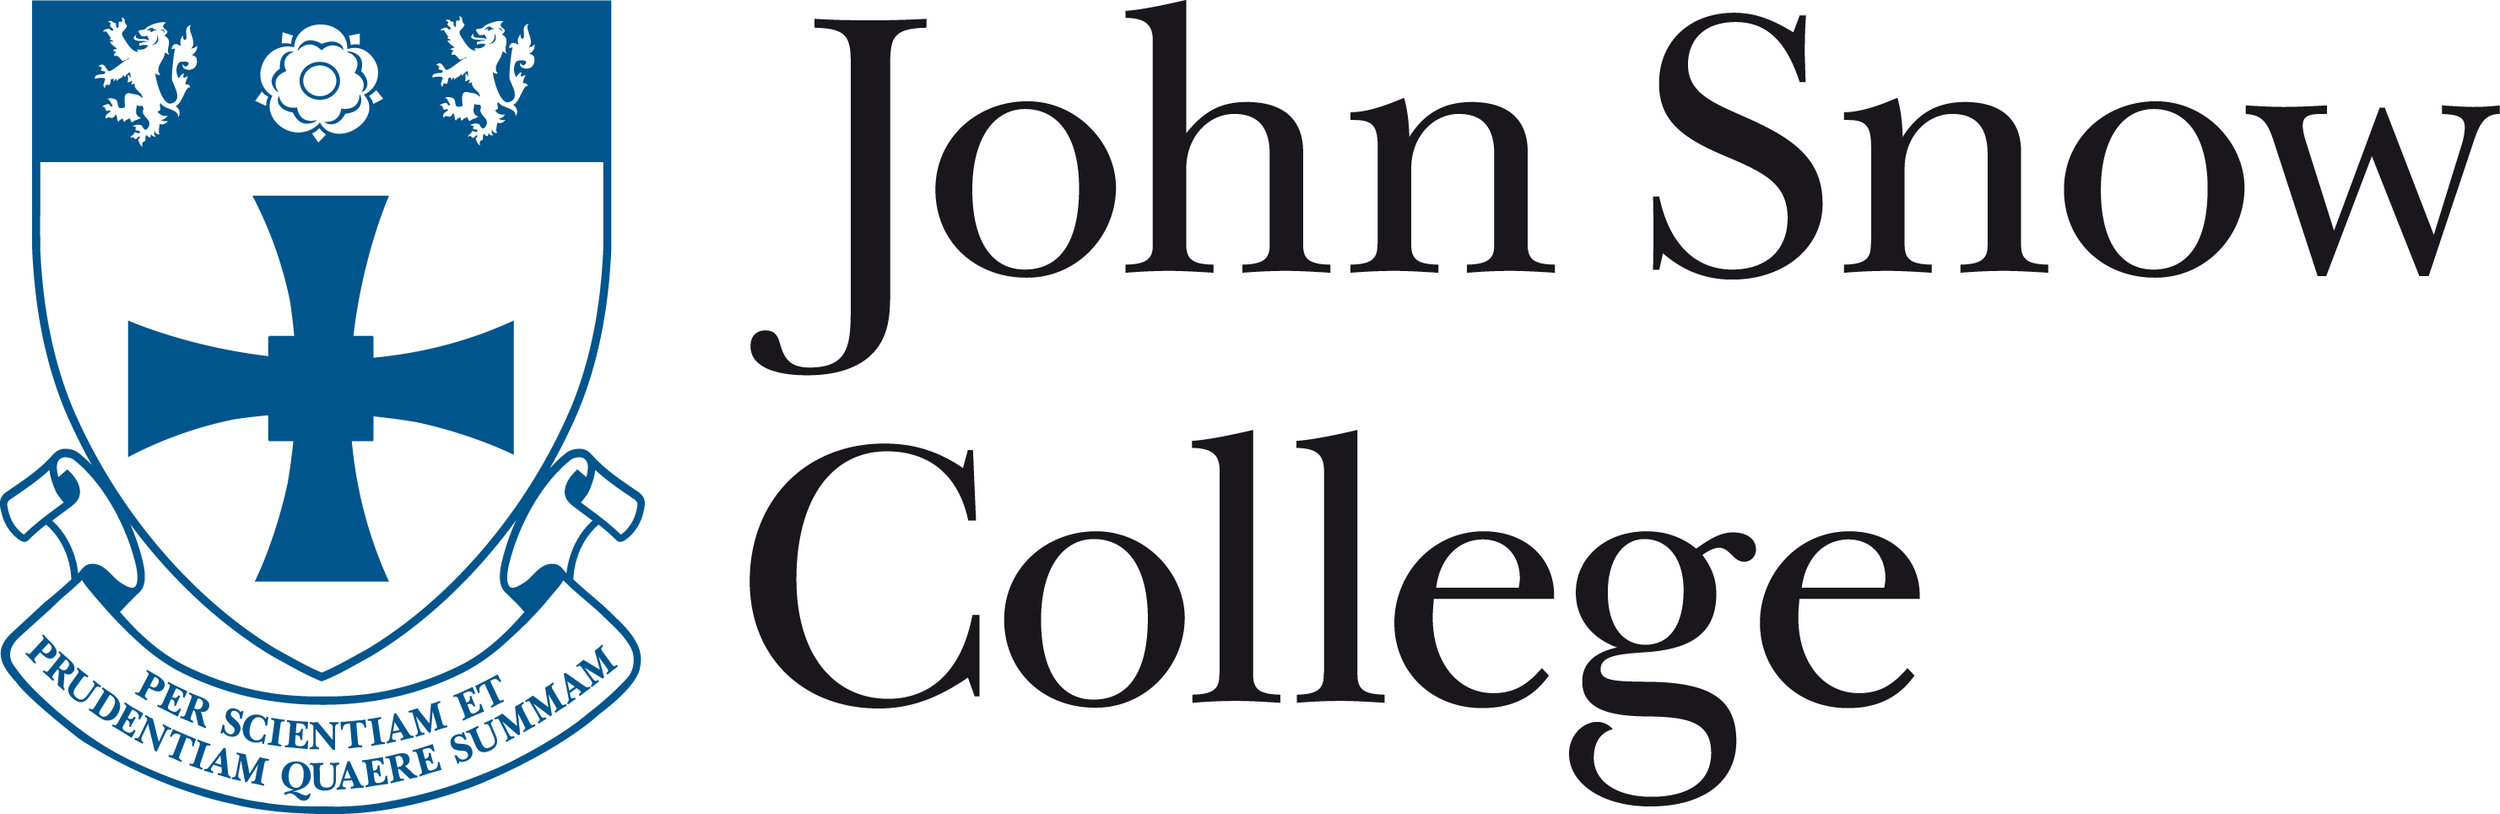 John-Snow-College-MAST-1-3.jpg